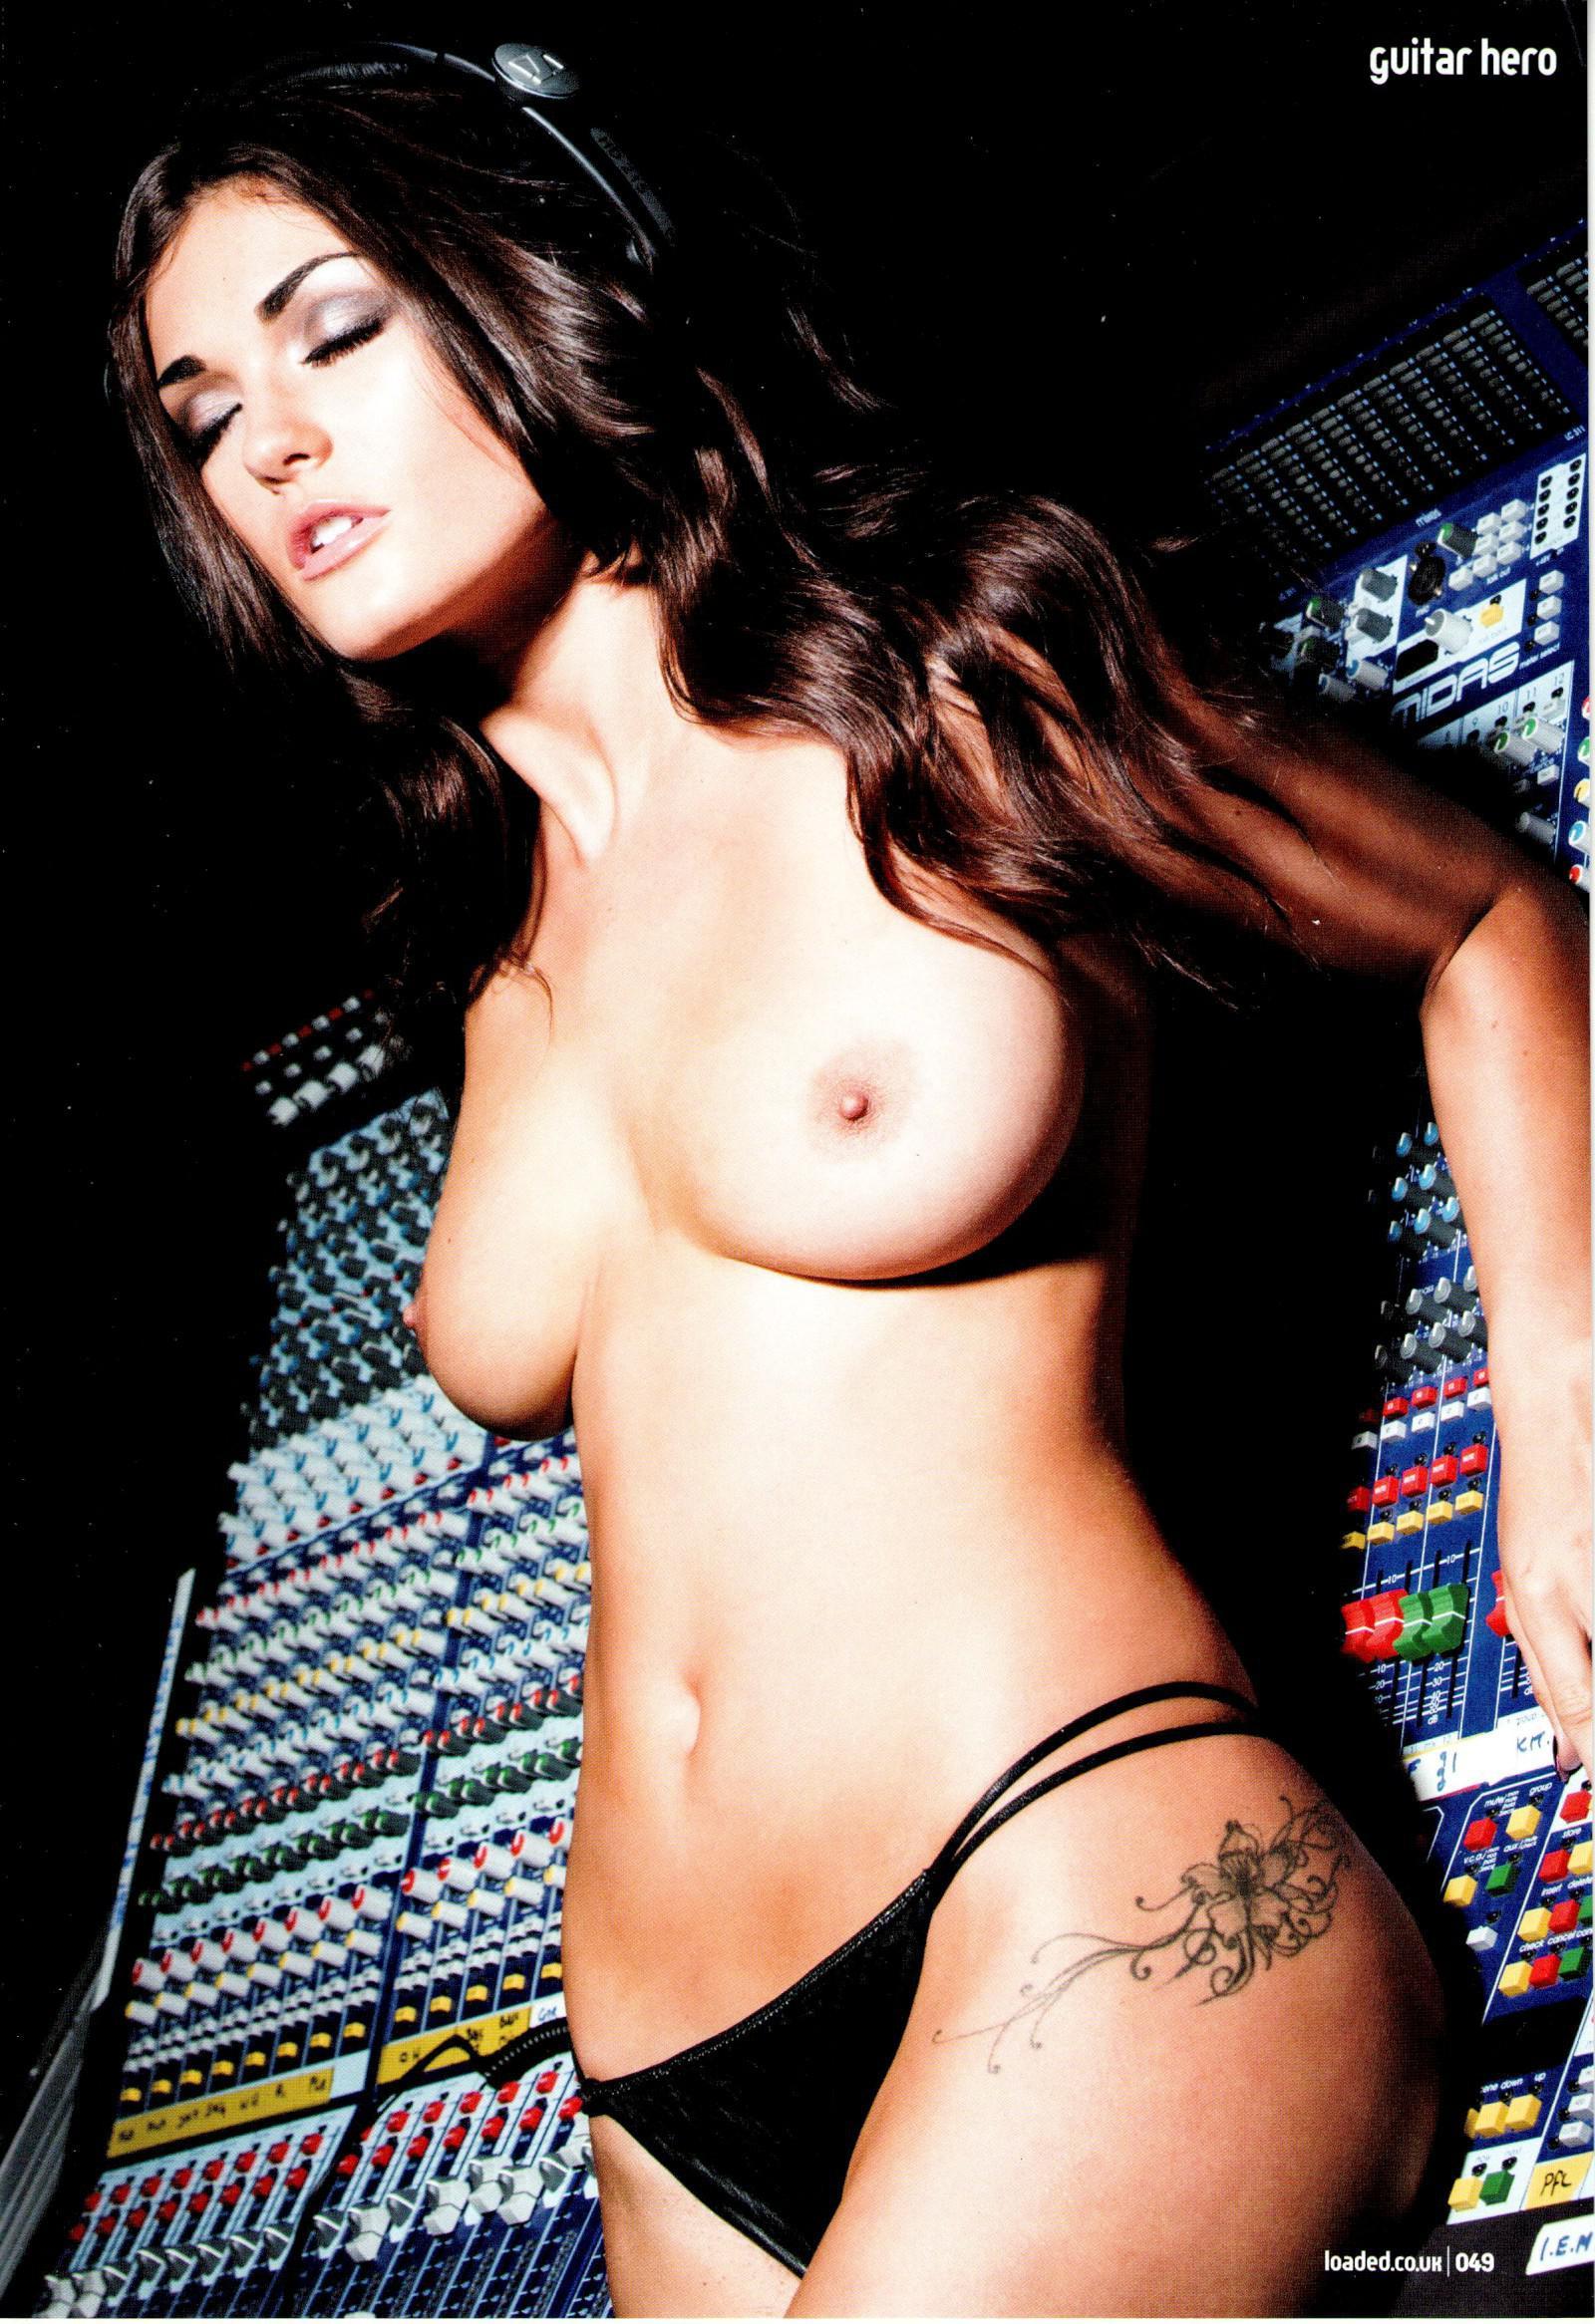 smirf-loaded-topless-video-lankan